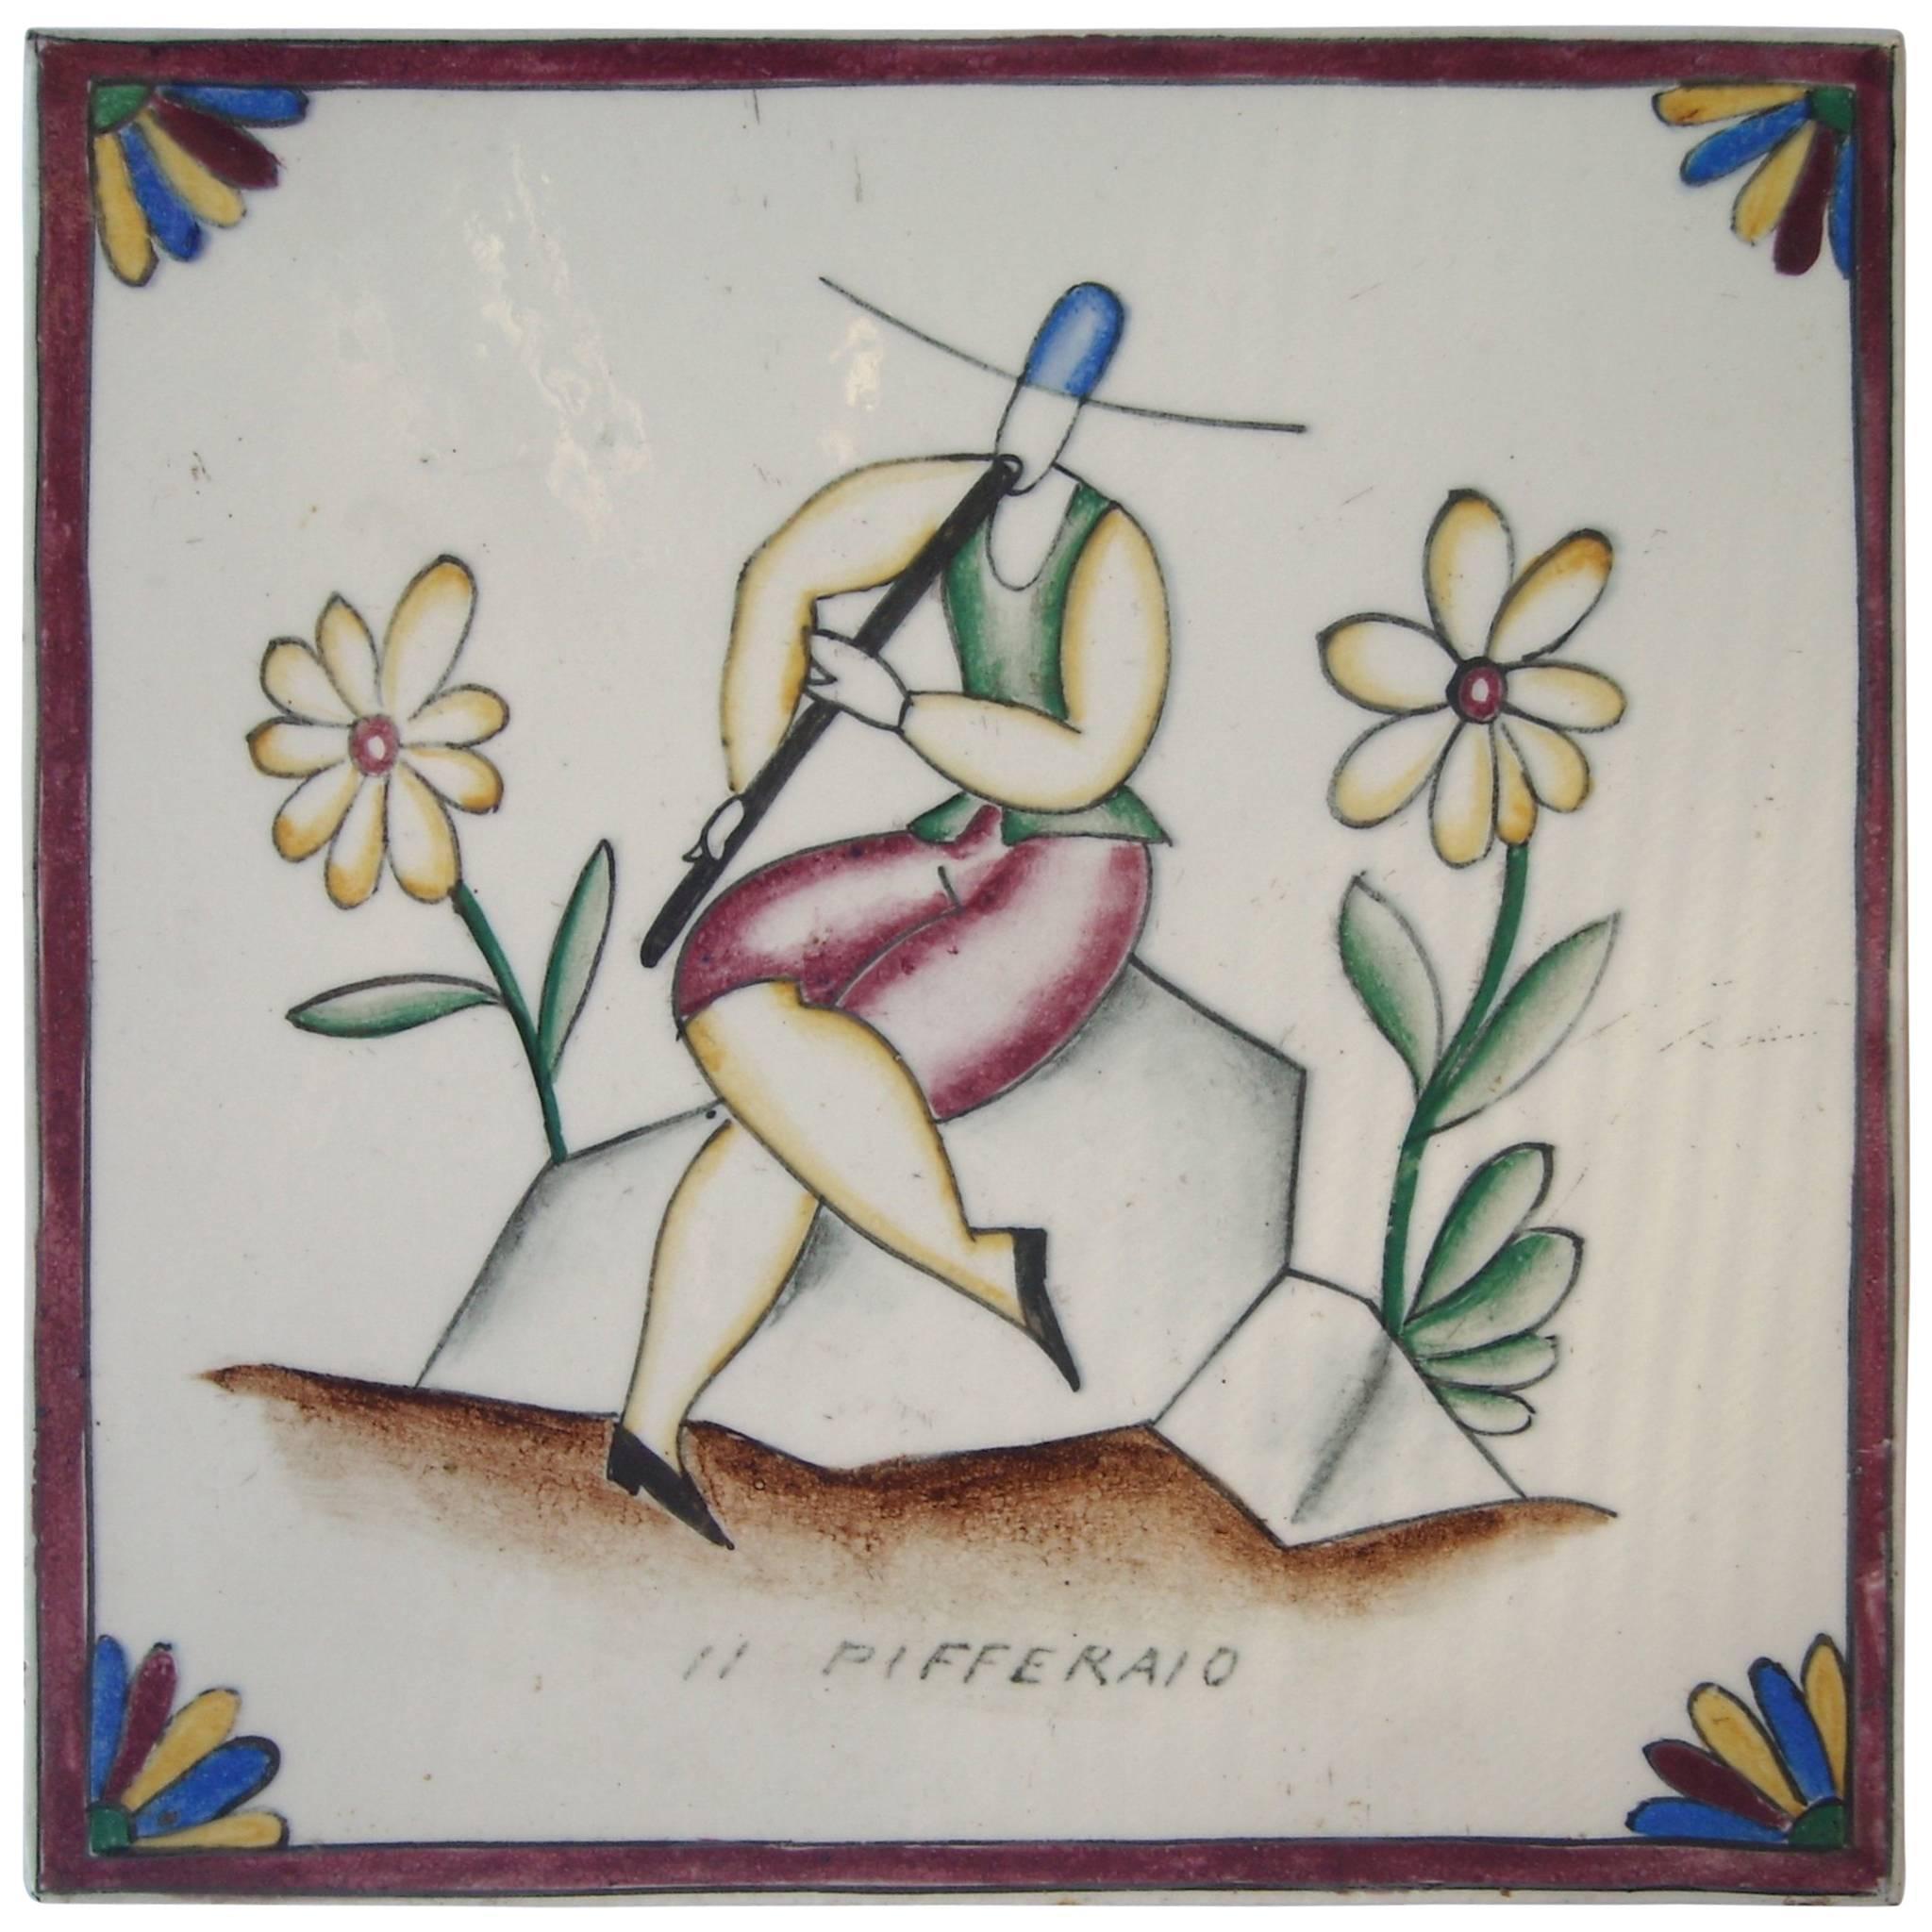 "Gio Ponti Tile or Ceramic for Richard Ginori, Title ""Il Pifferaio"""